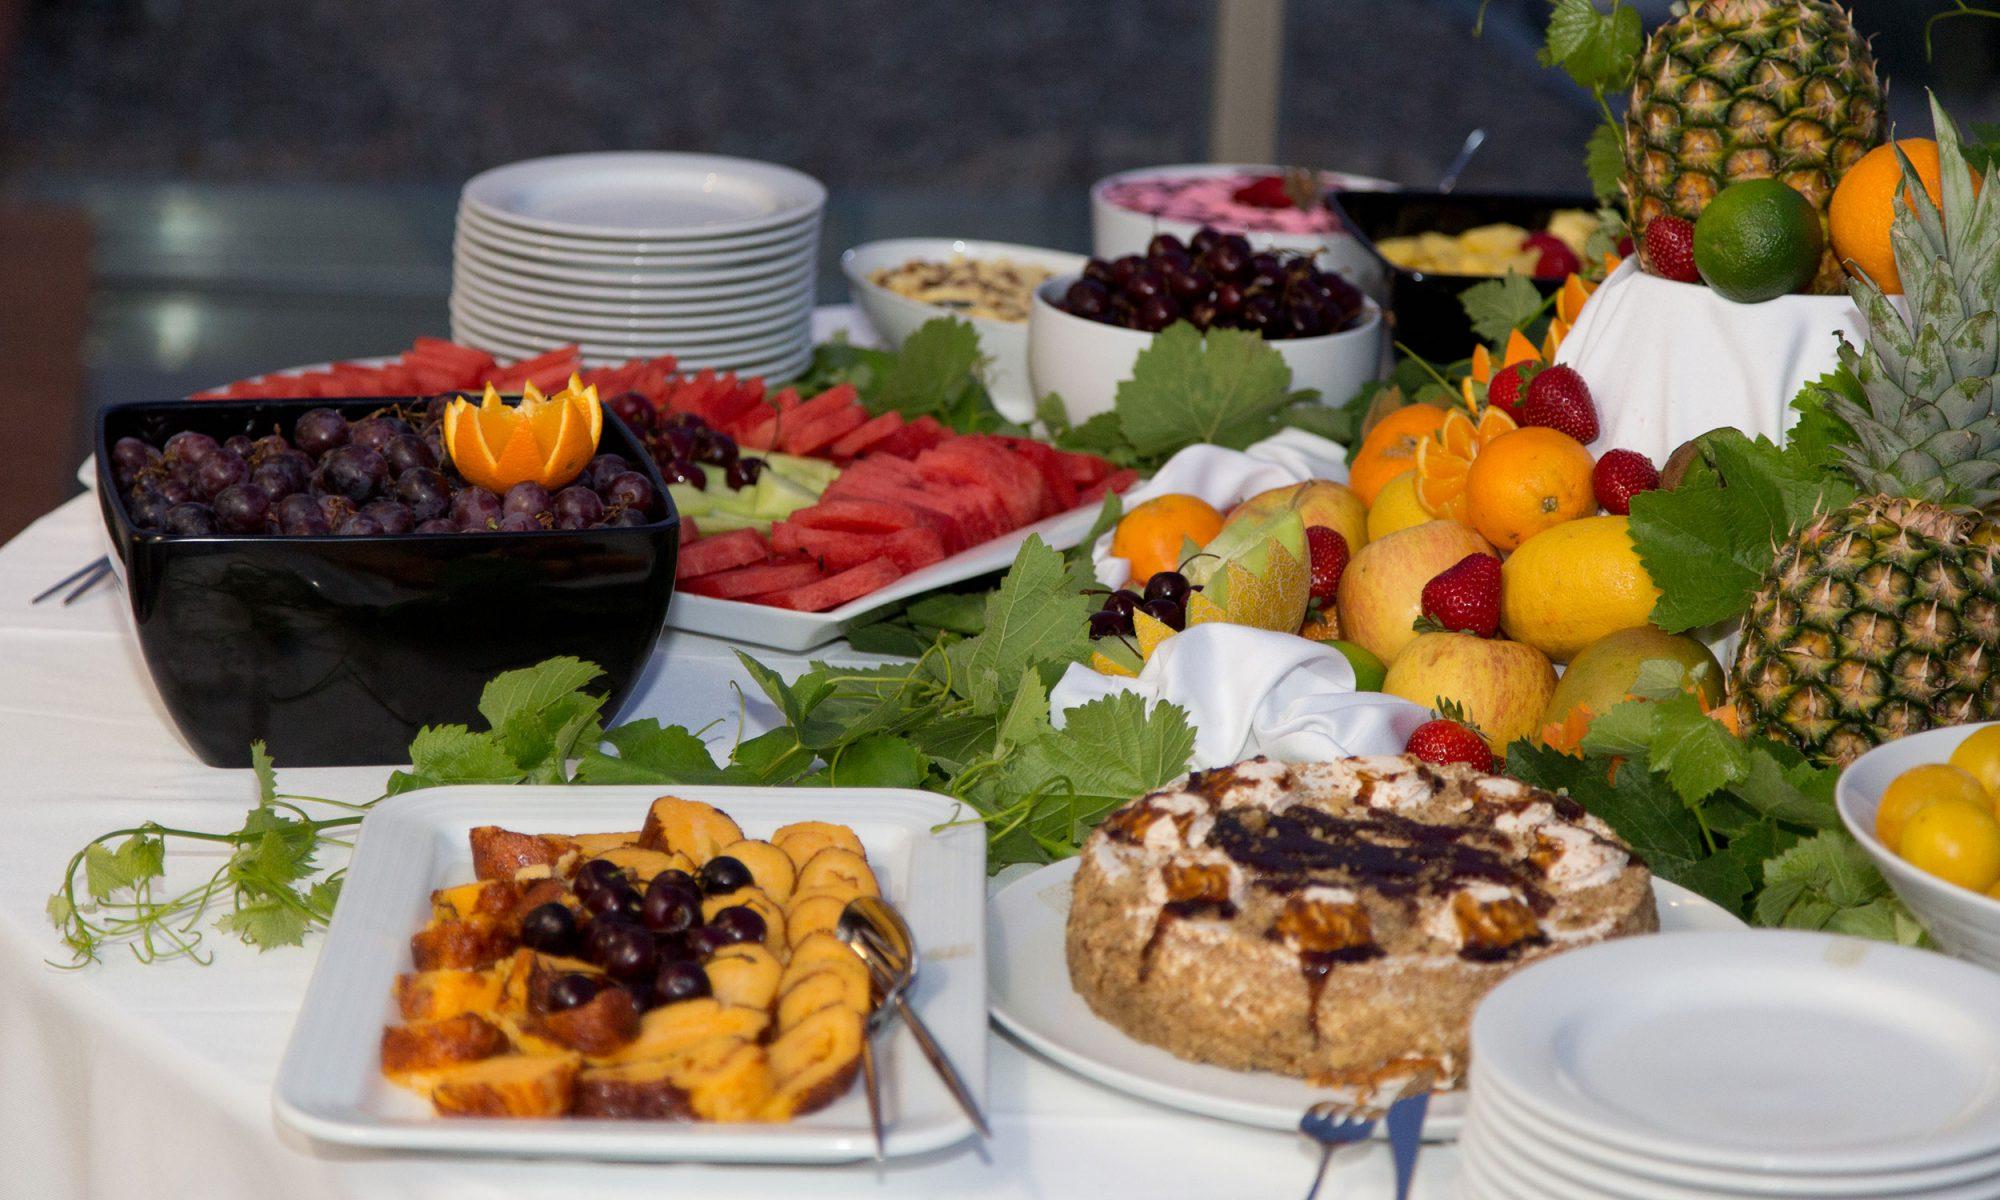 EC: An Ode to the Hotel Breakfast Buffet